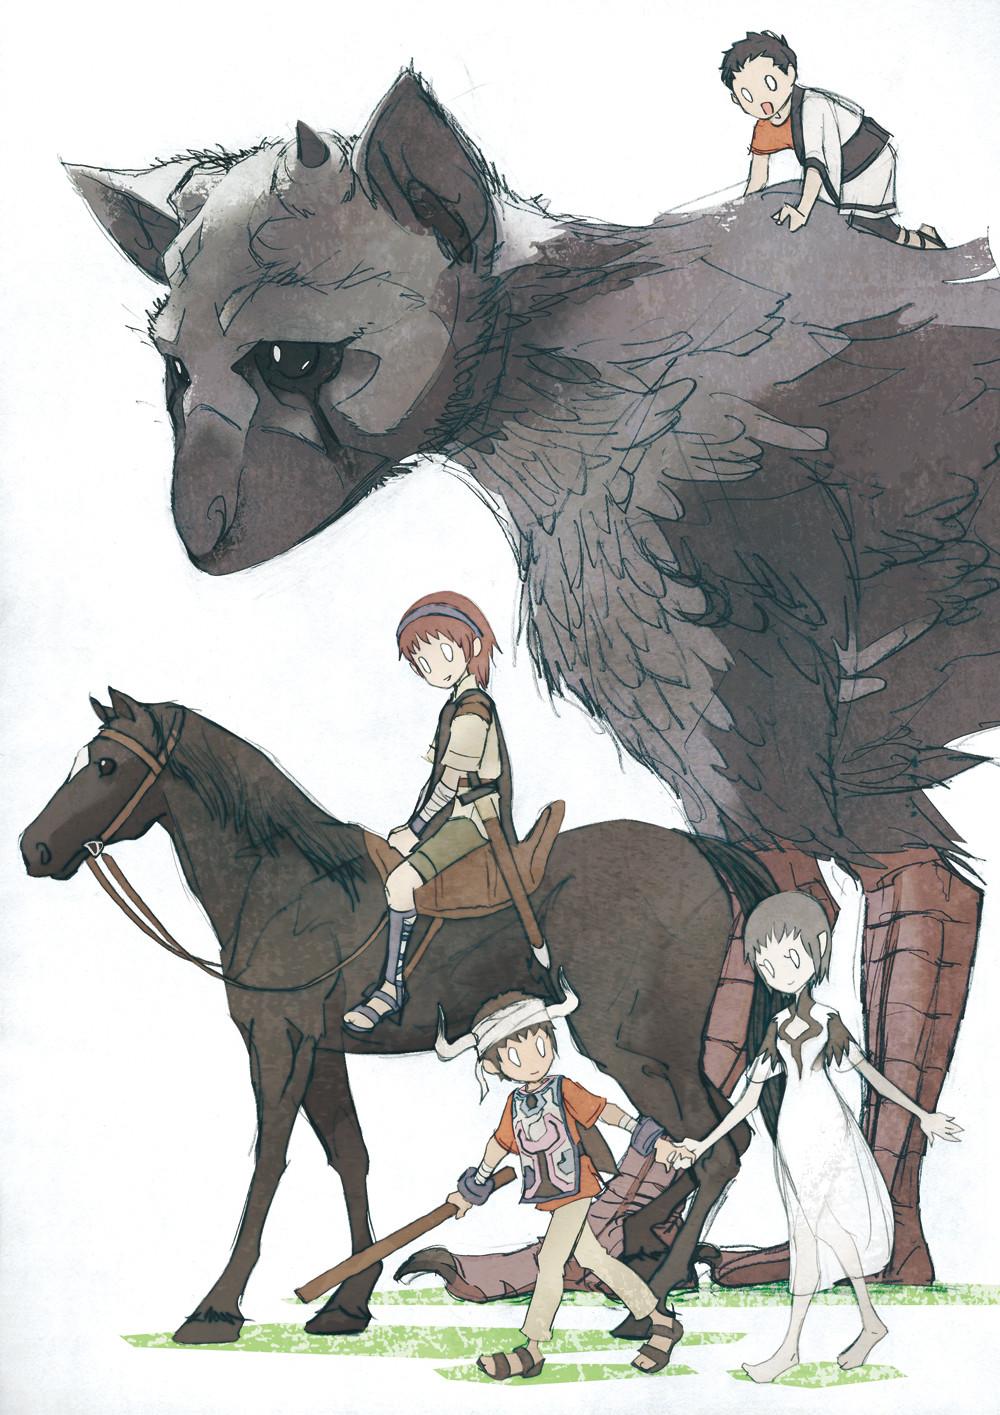 ArtStation - ICO & Shadow of the Colossus, Ikuya Nakamura